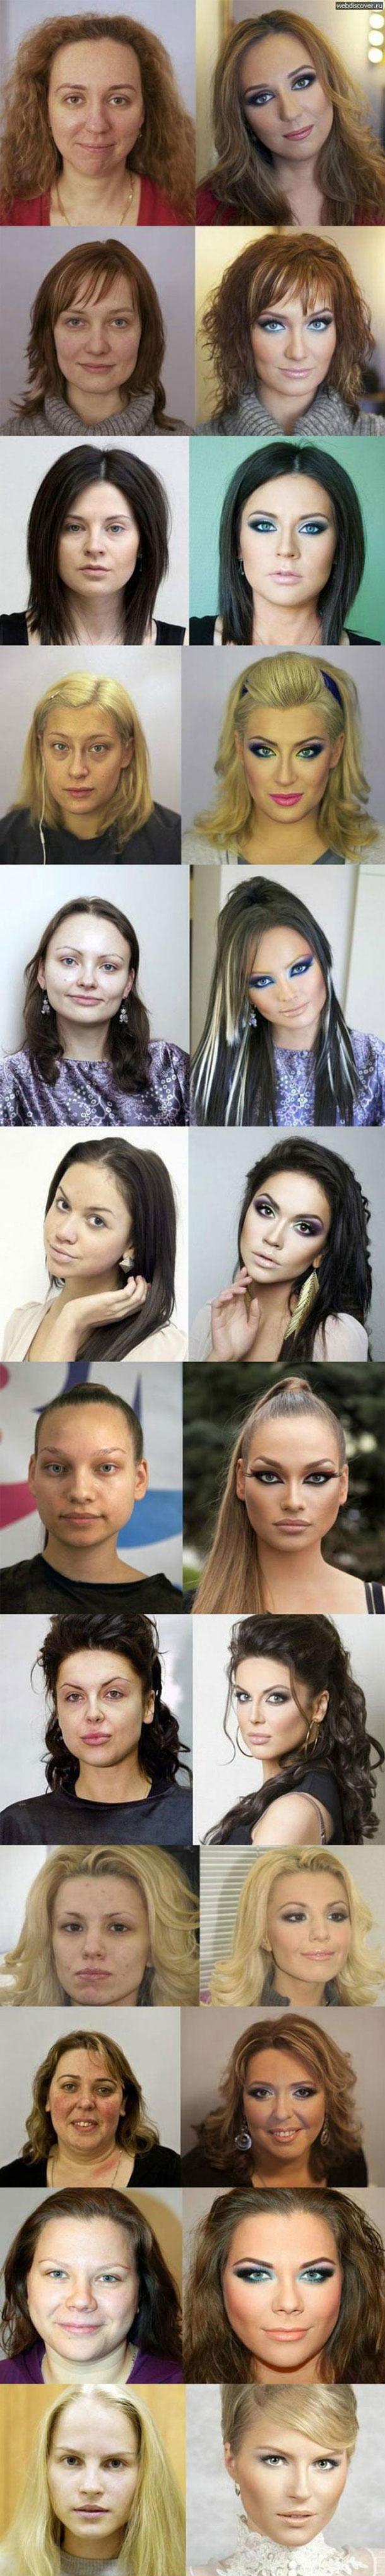 evil-makeup